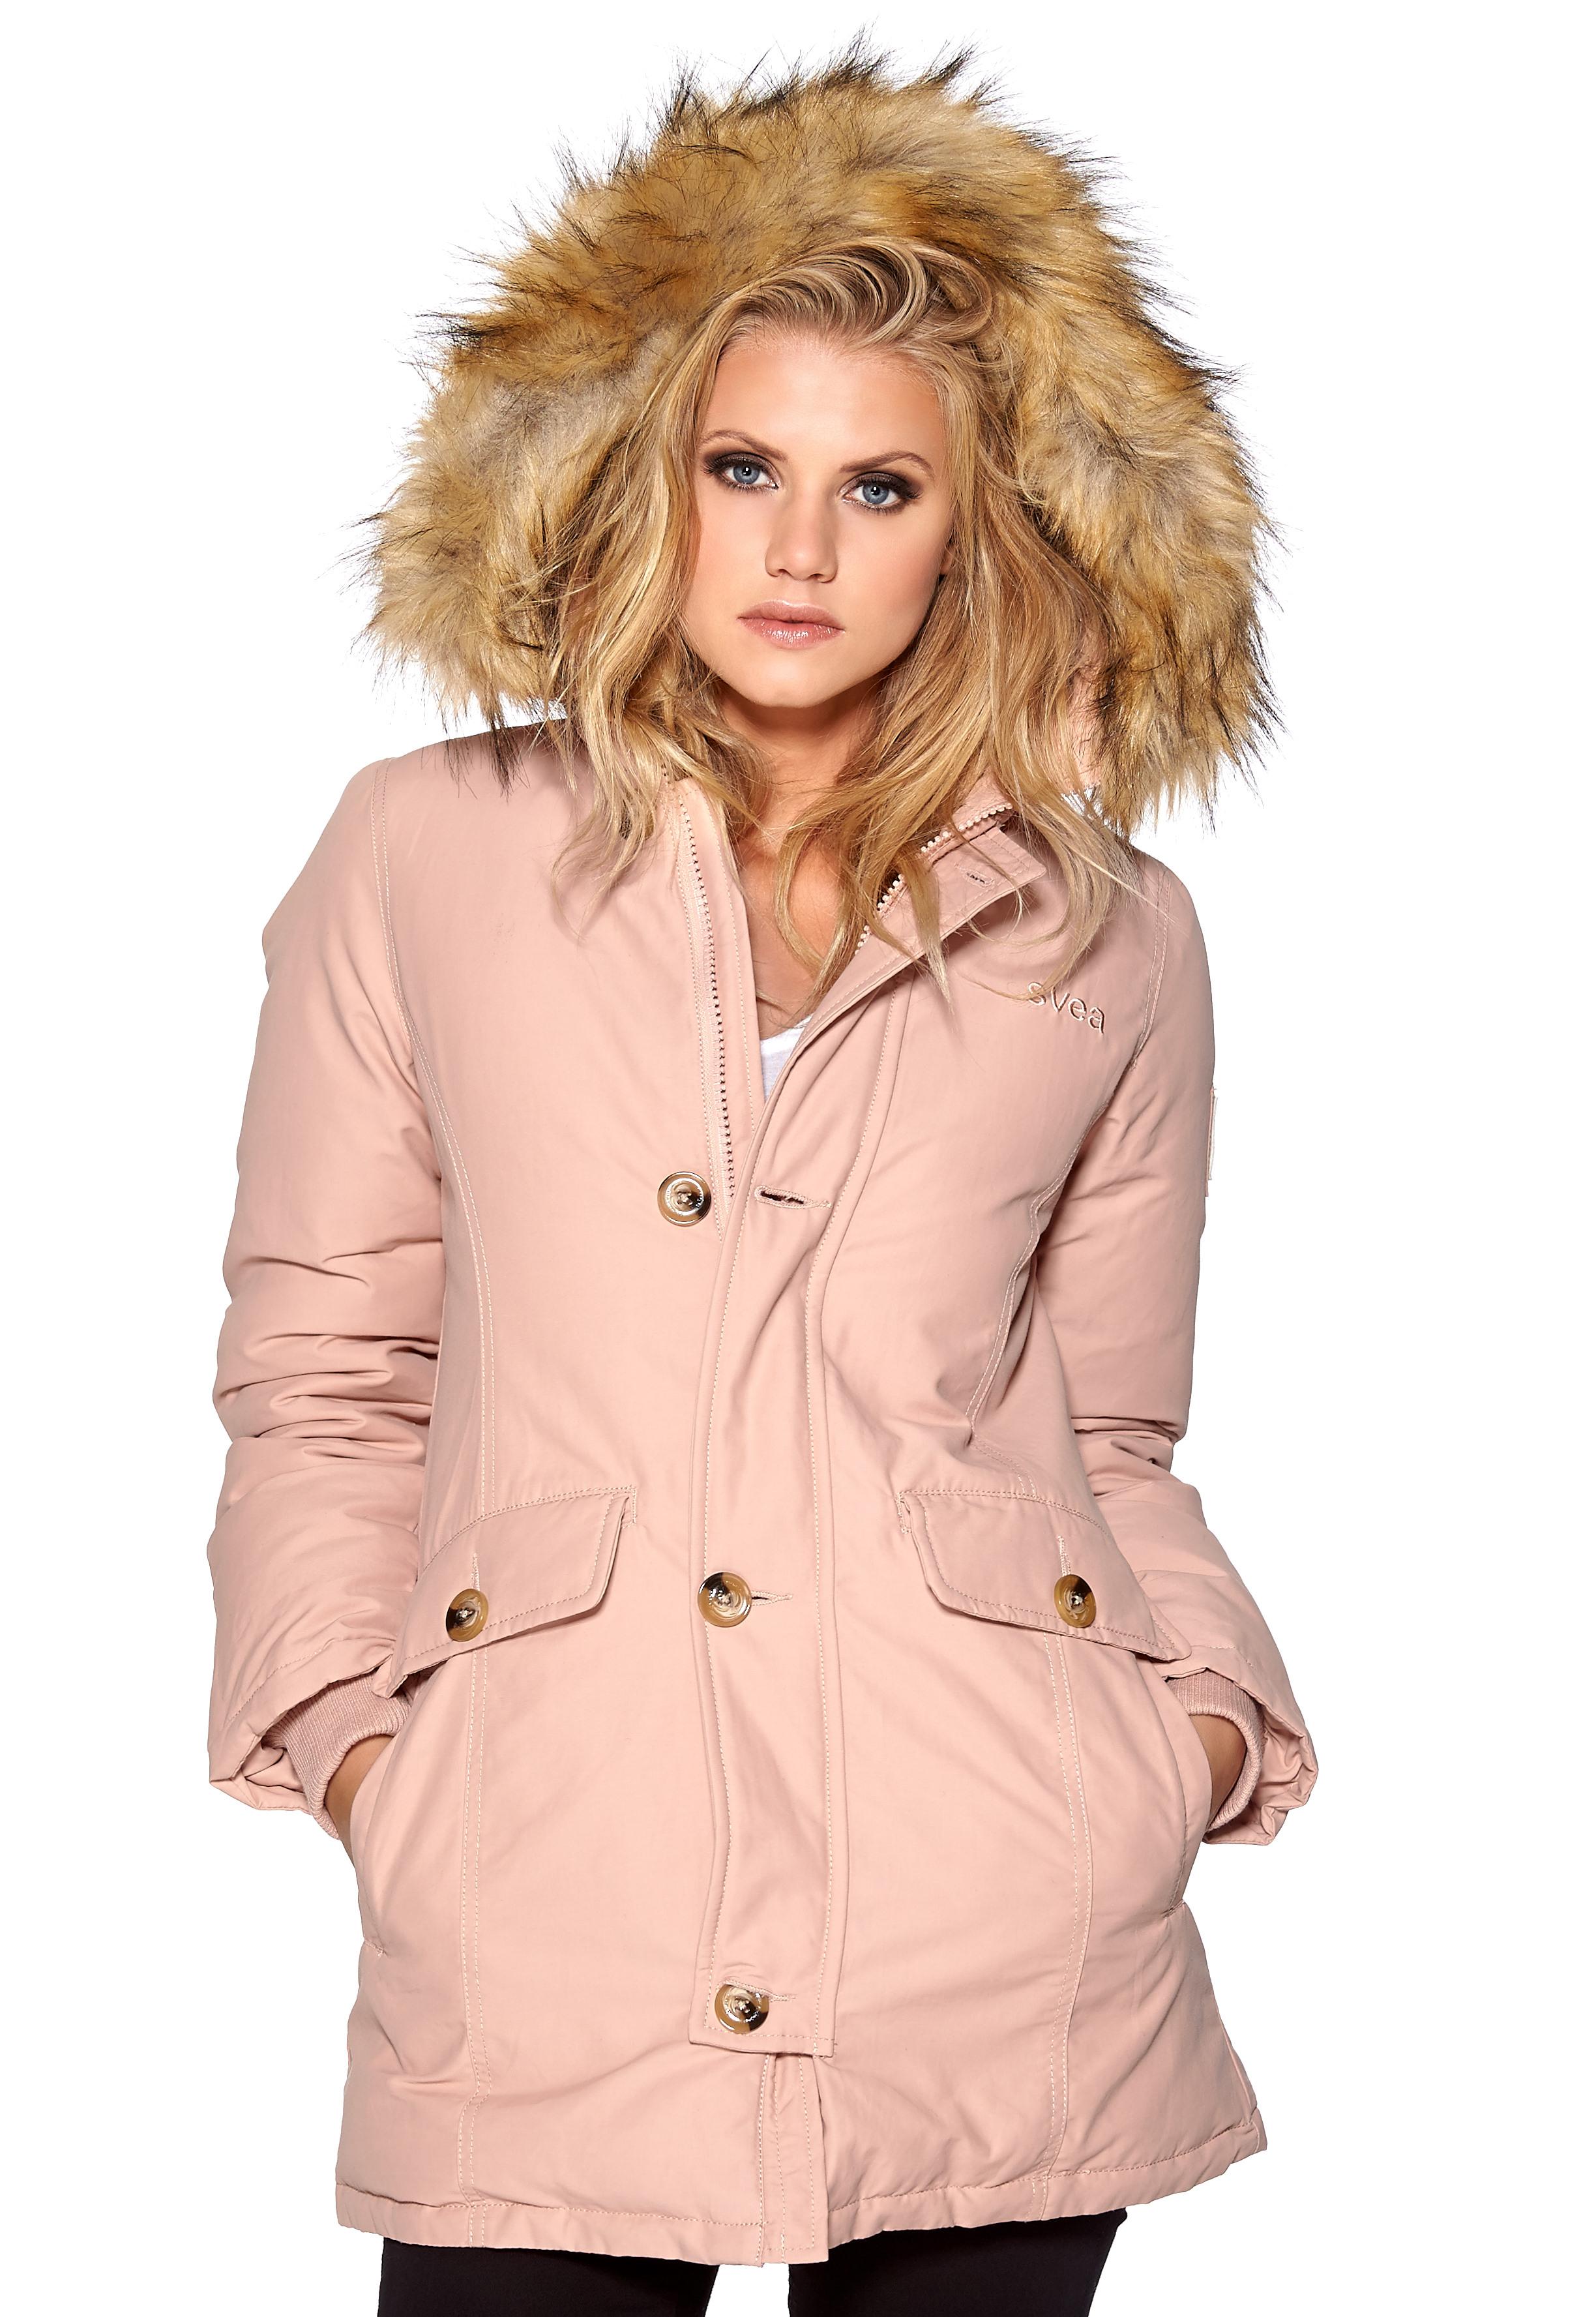 Svea Miss Smith Jacket Dirty Pink - Bubbleroom 856e8740dd